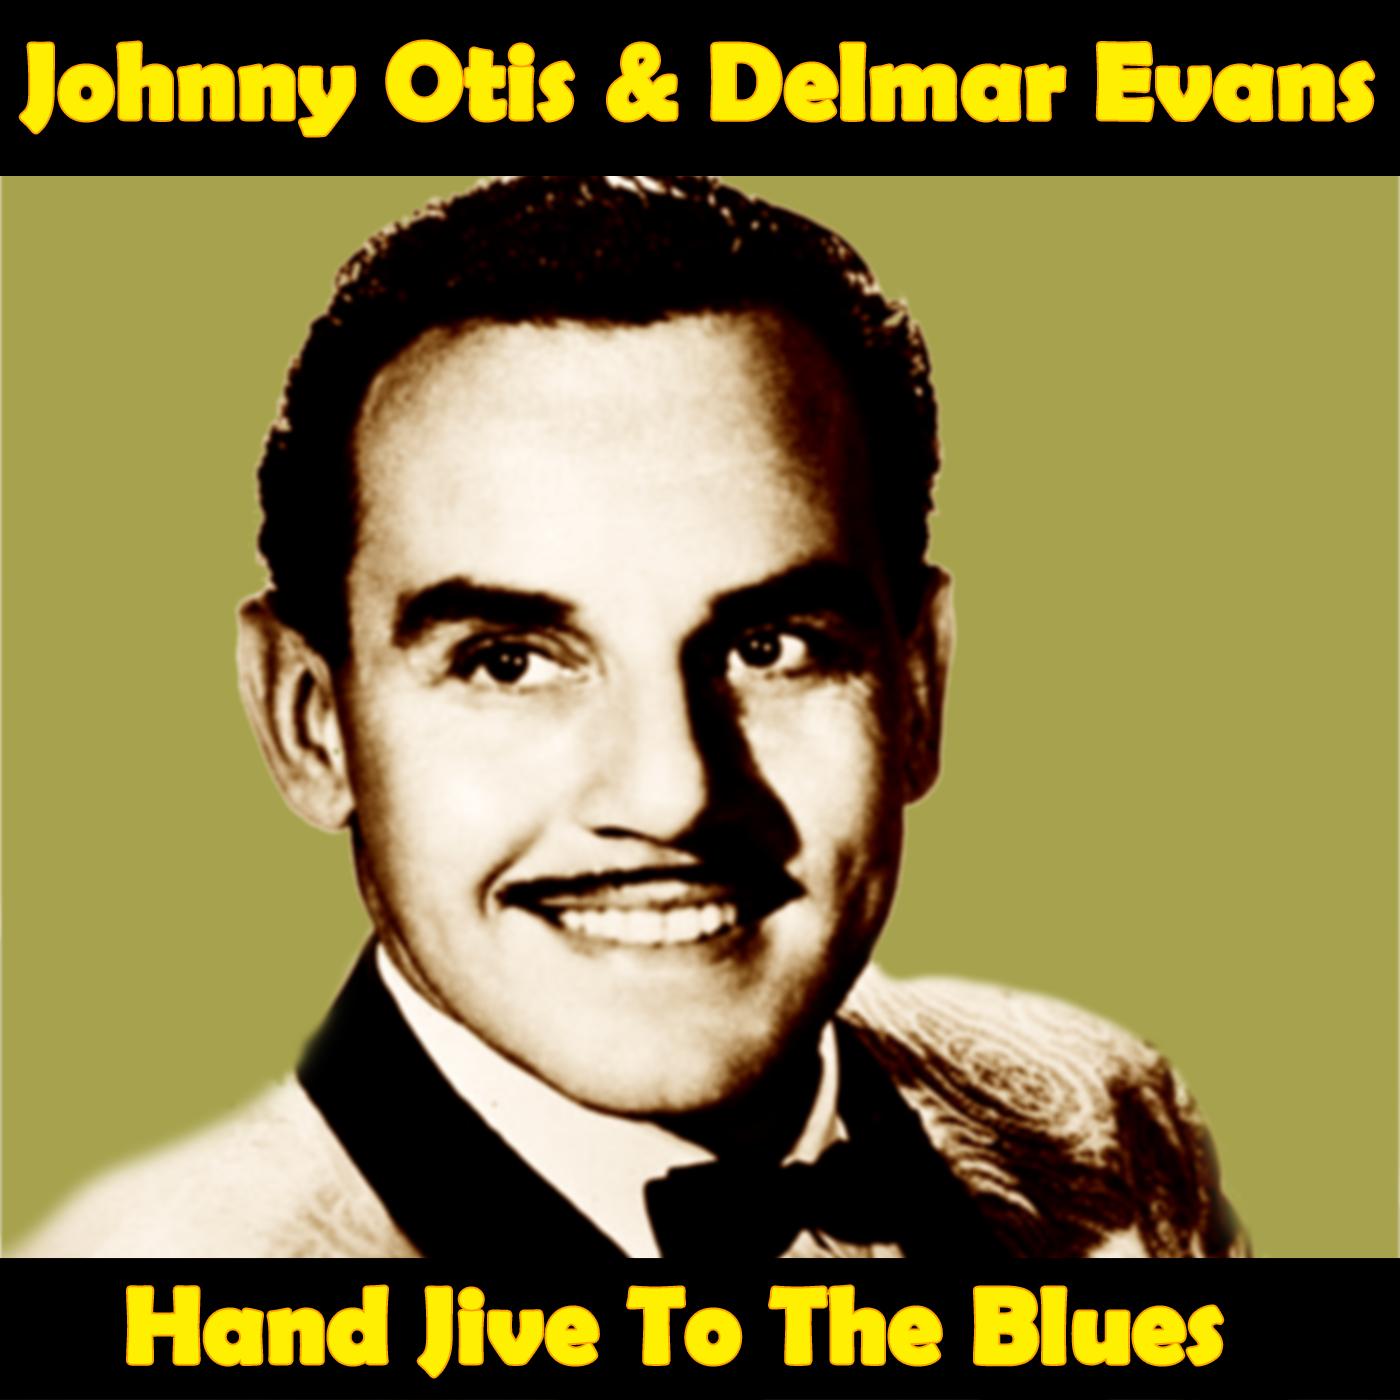 Johnny Otis Hand Clap Jive